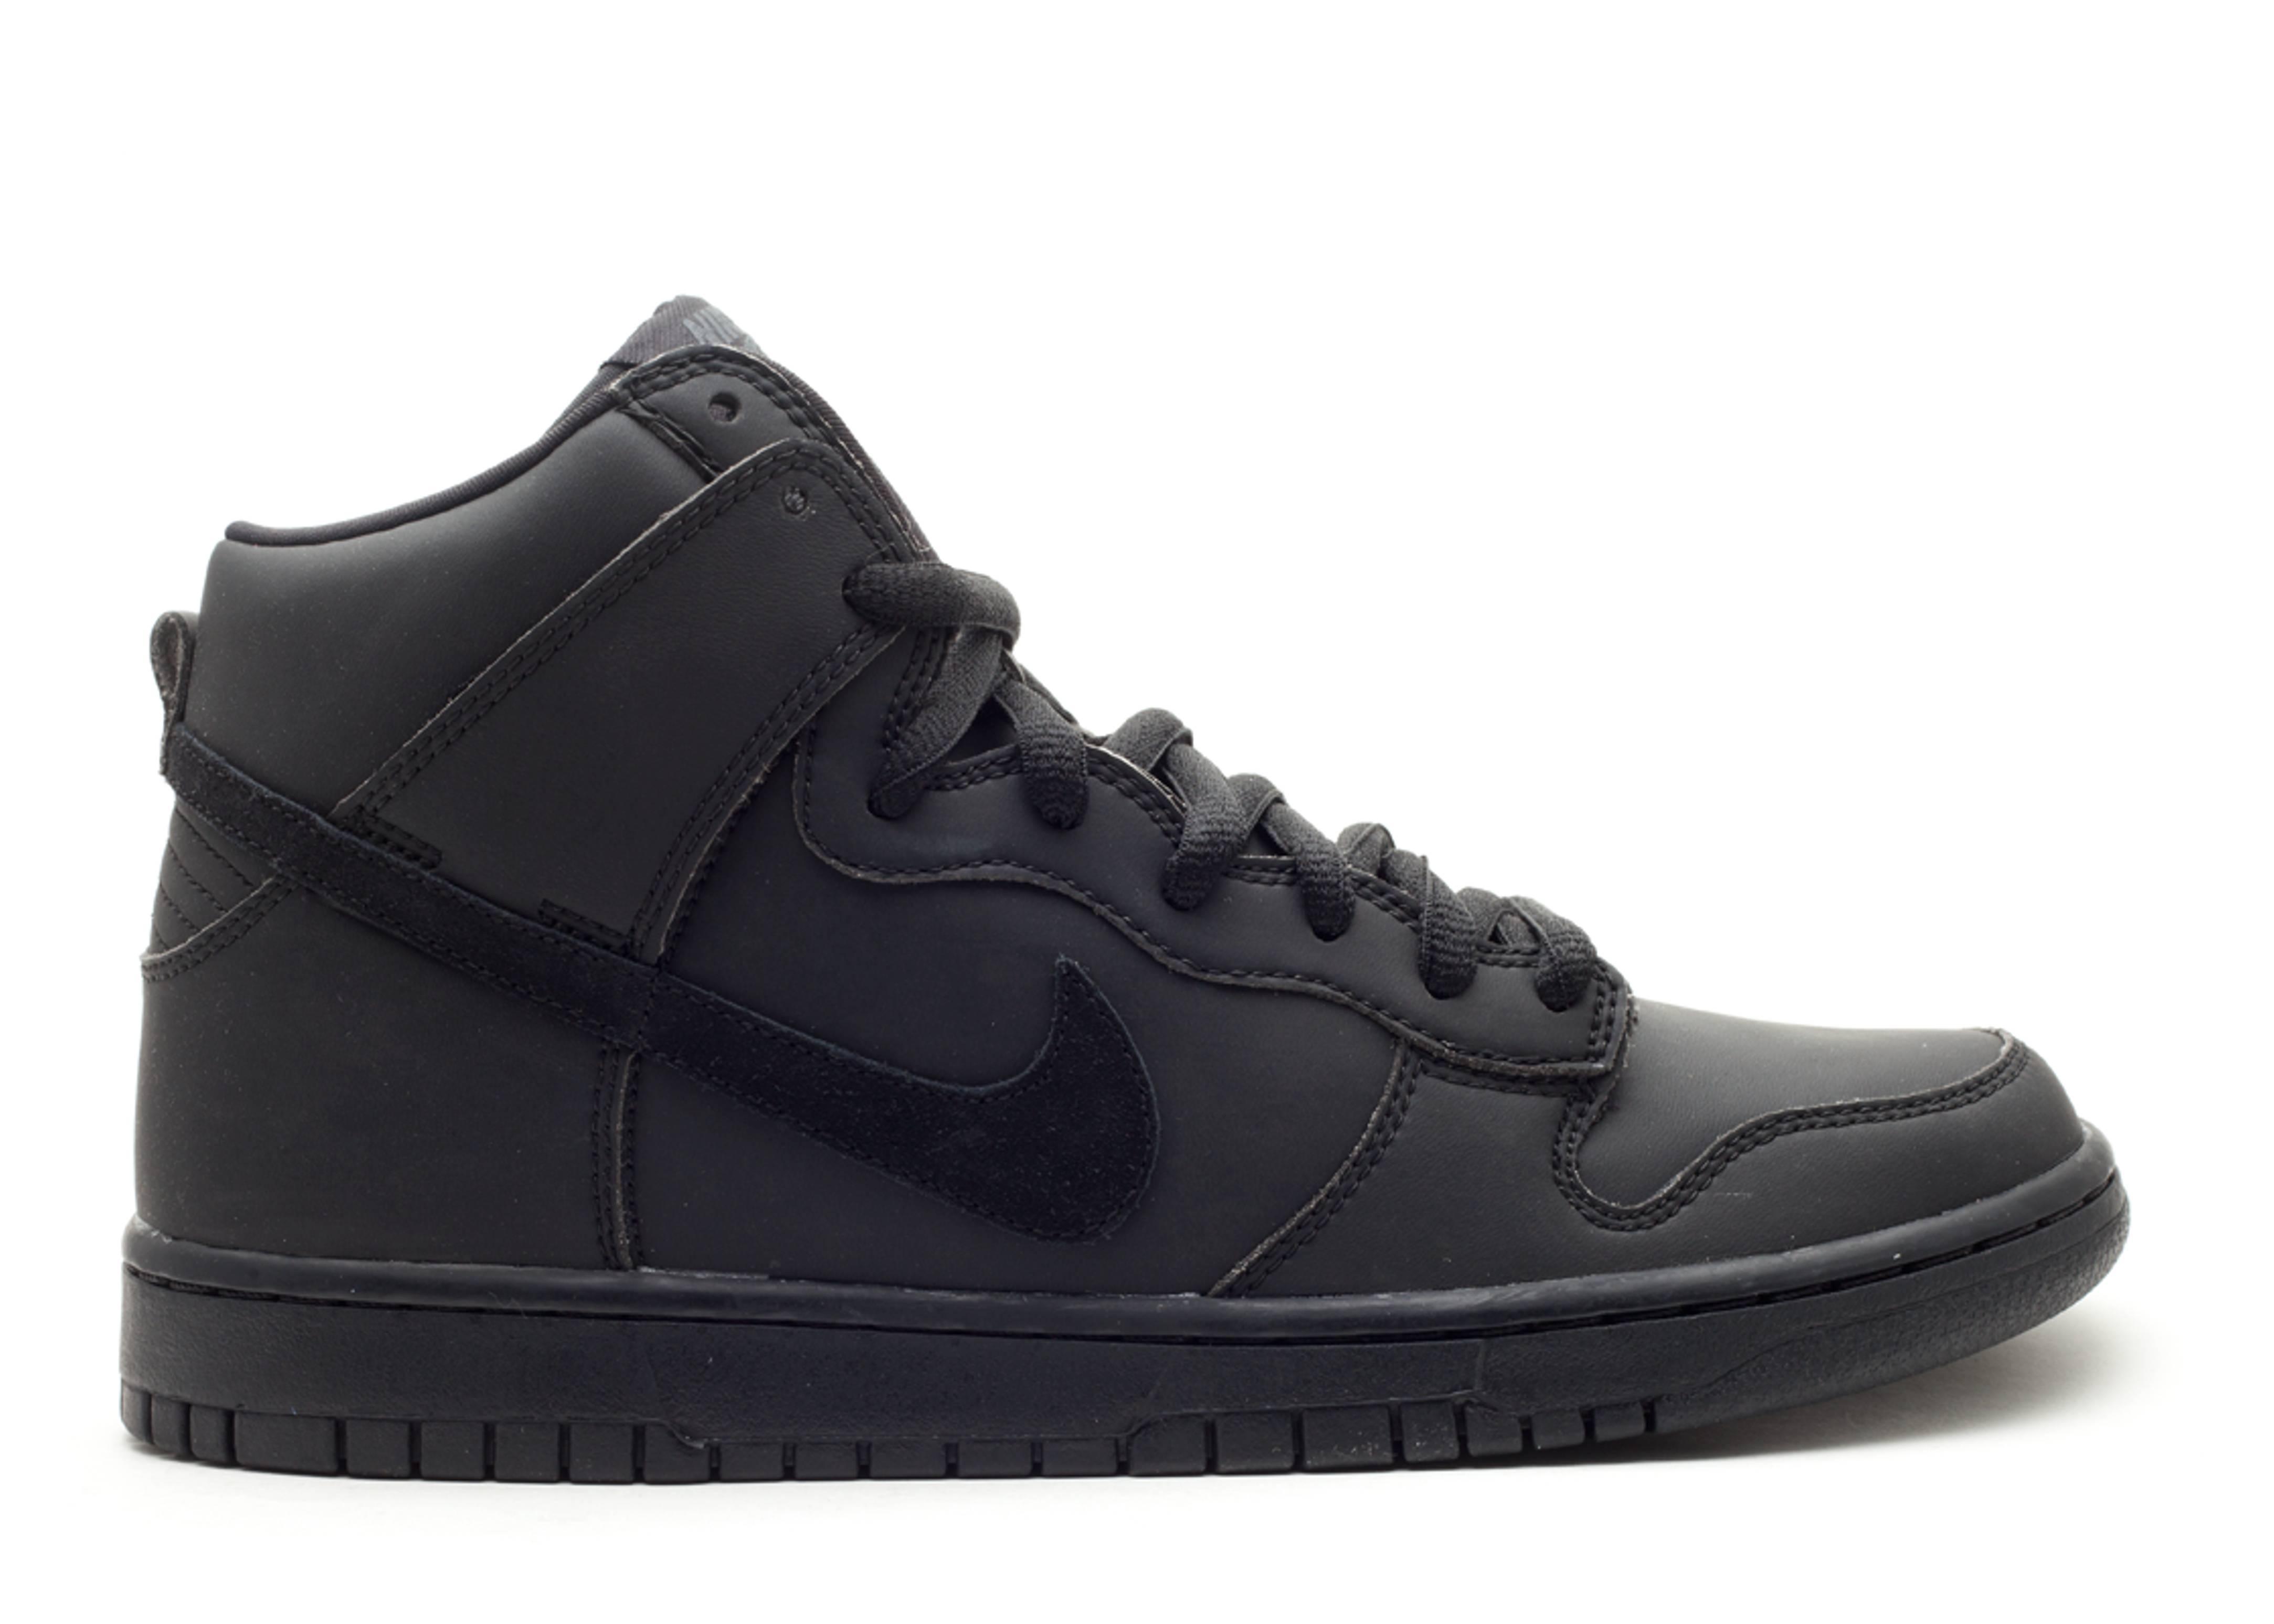 Nike SB Dunk High Premium - Black